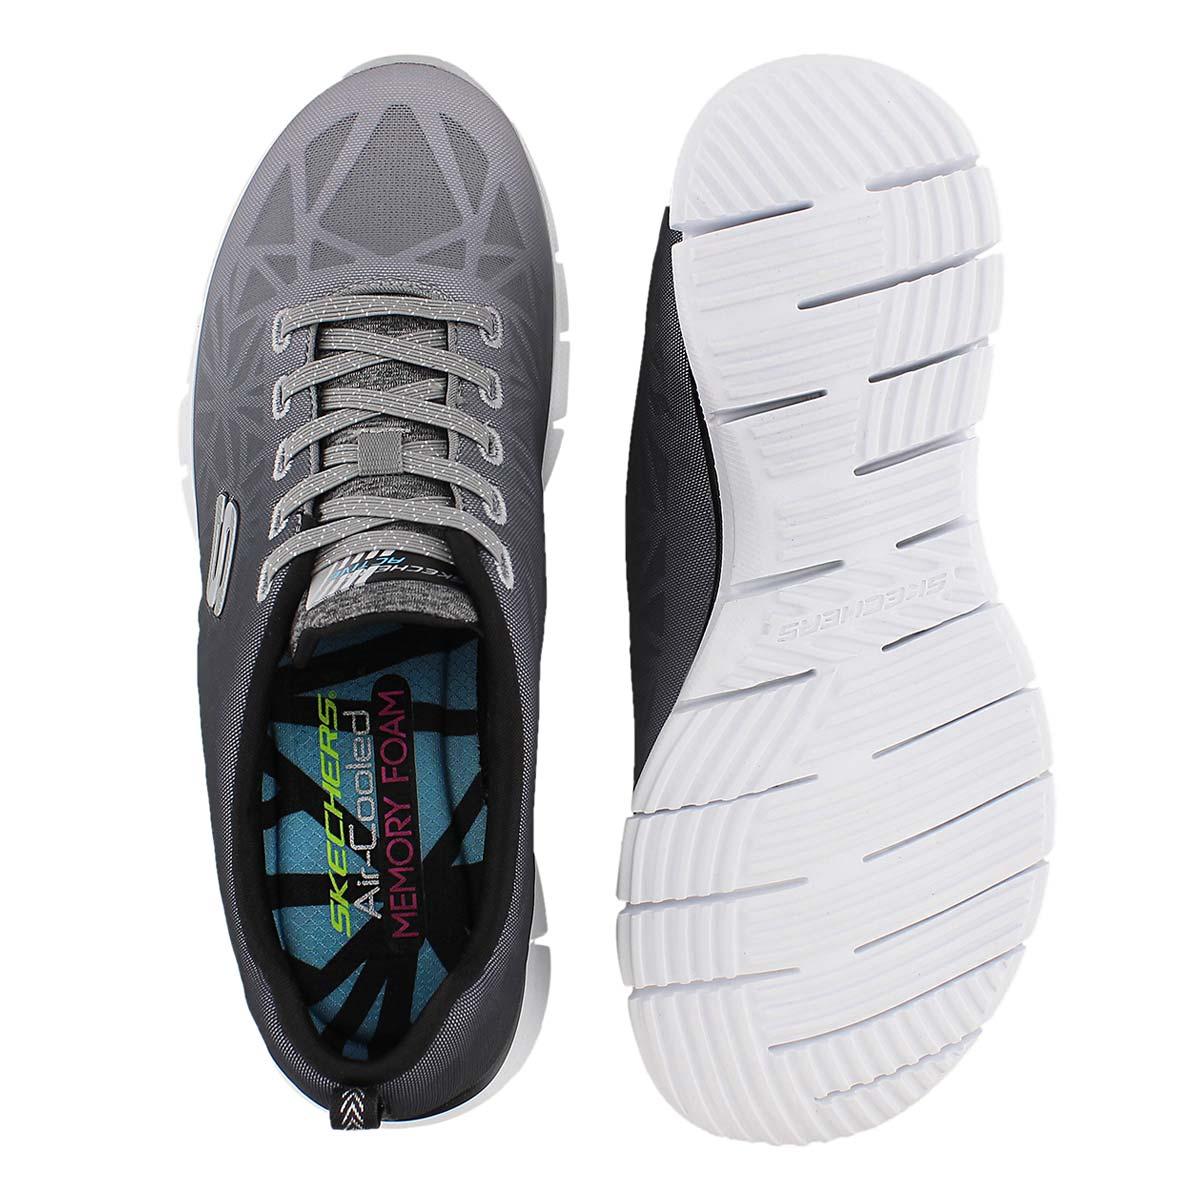 Lds Zealous blk/wht slipon sneaker